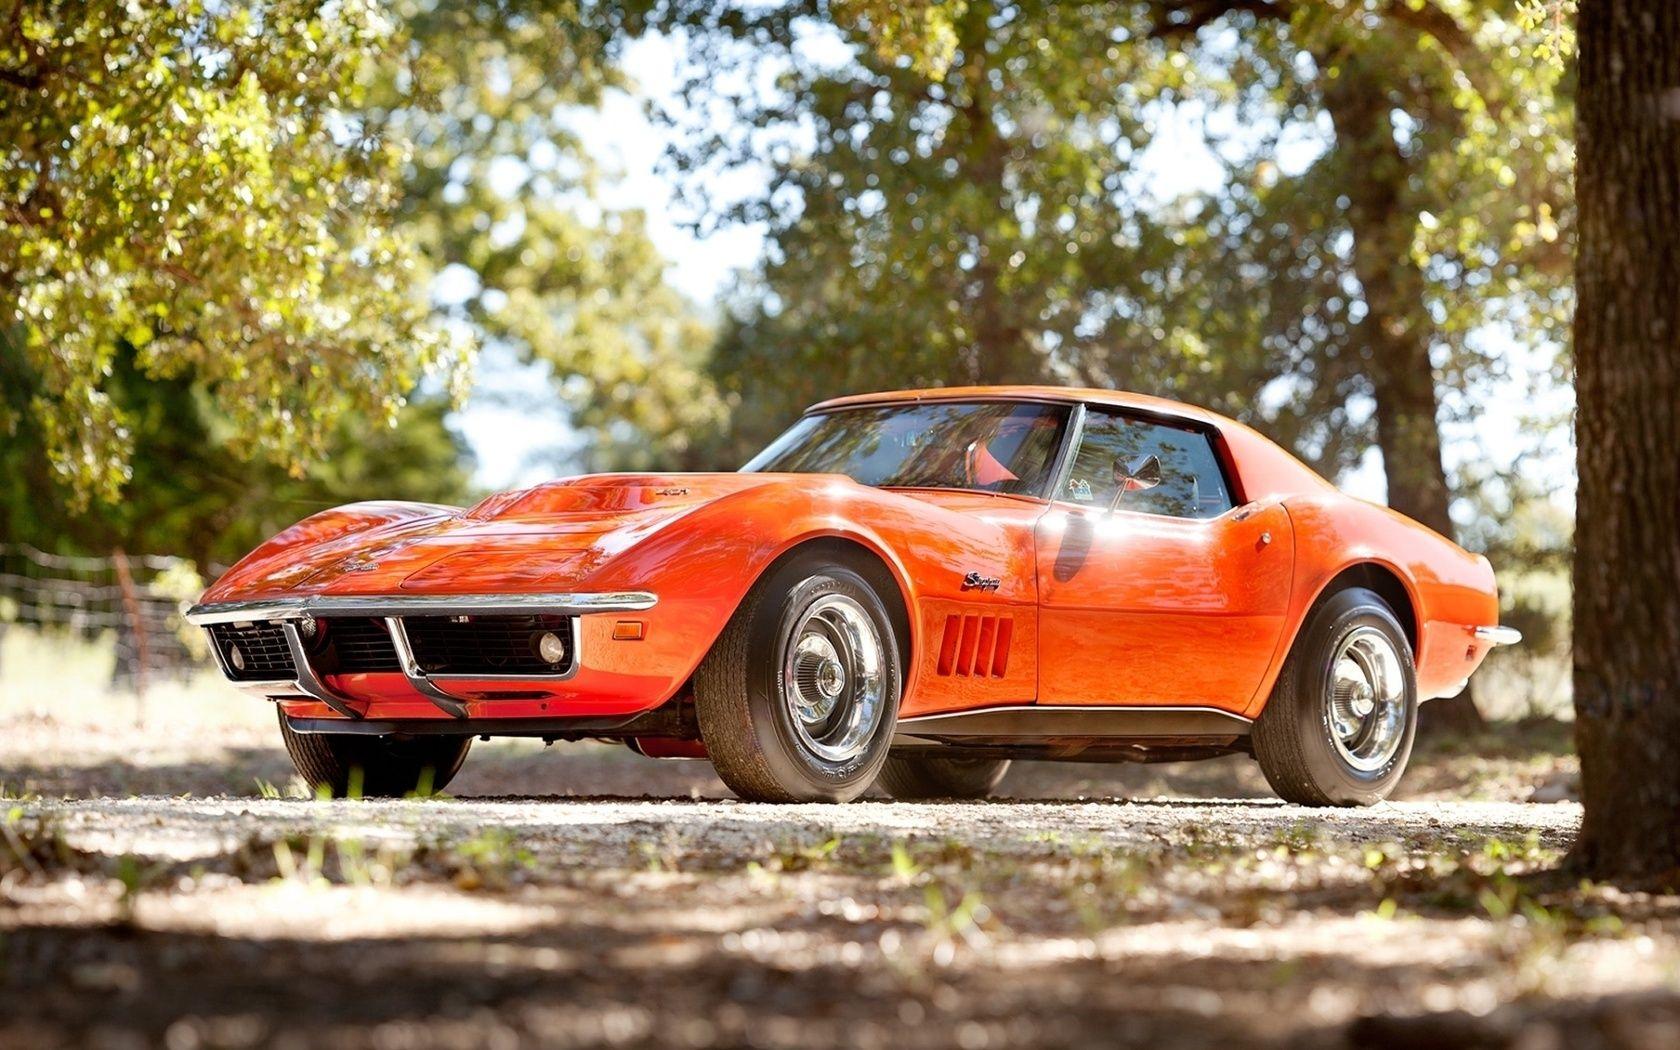 Orange chevrolet corvette hd http imashon com w auto